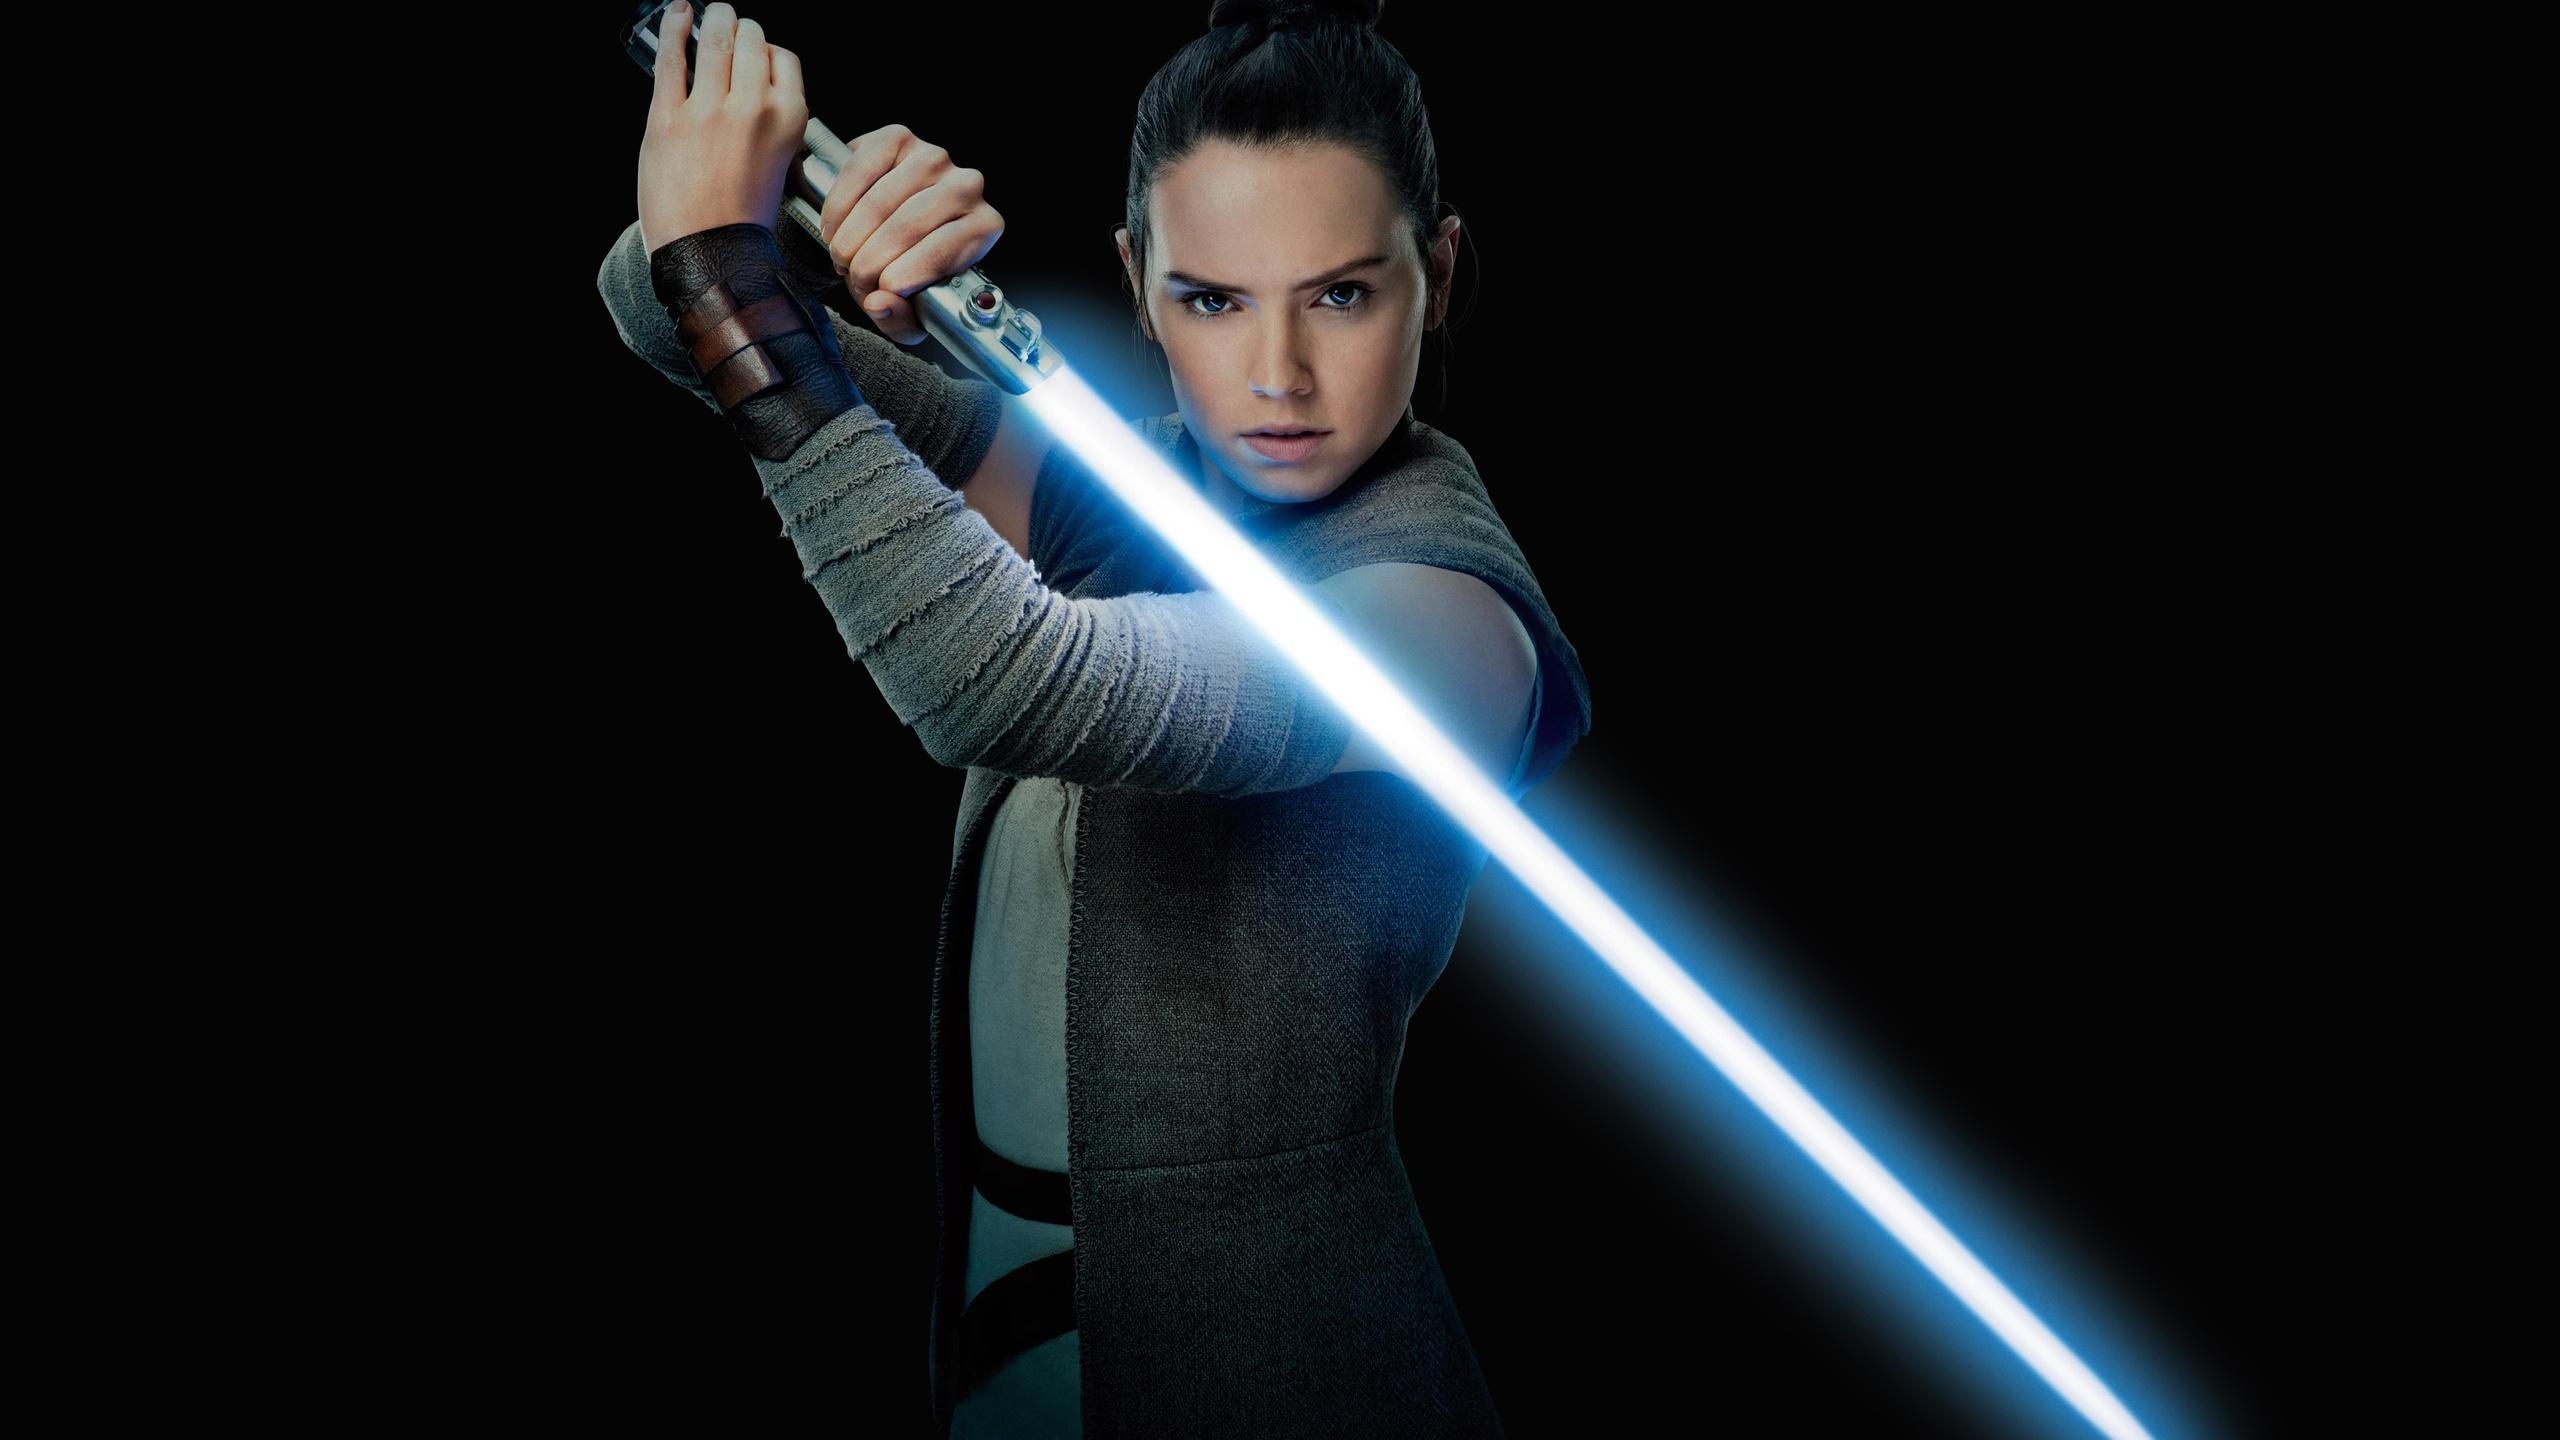 2560x1440 Daisy Ridley As Rey Star Wars In The Last Jedi